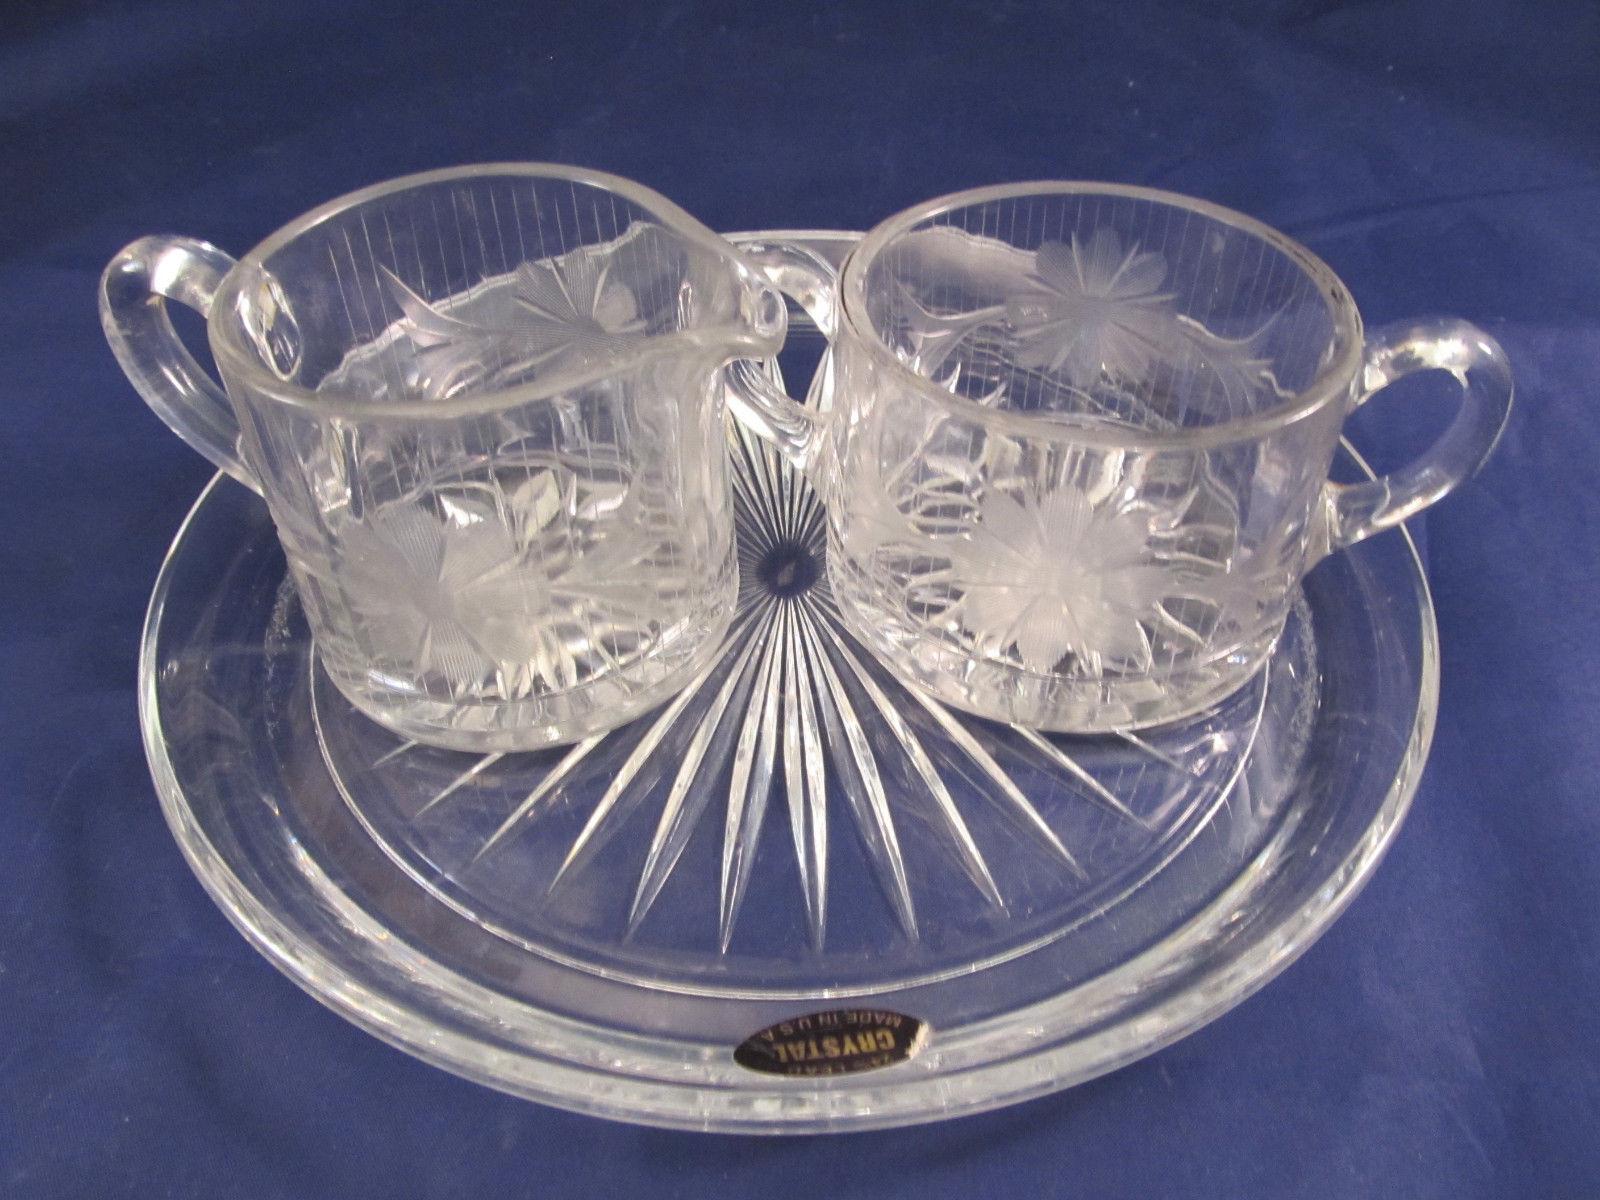 Wonderful Crystal Breakfast Set Or Afternoon Tea – Cream Sugar & Tray -